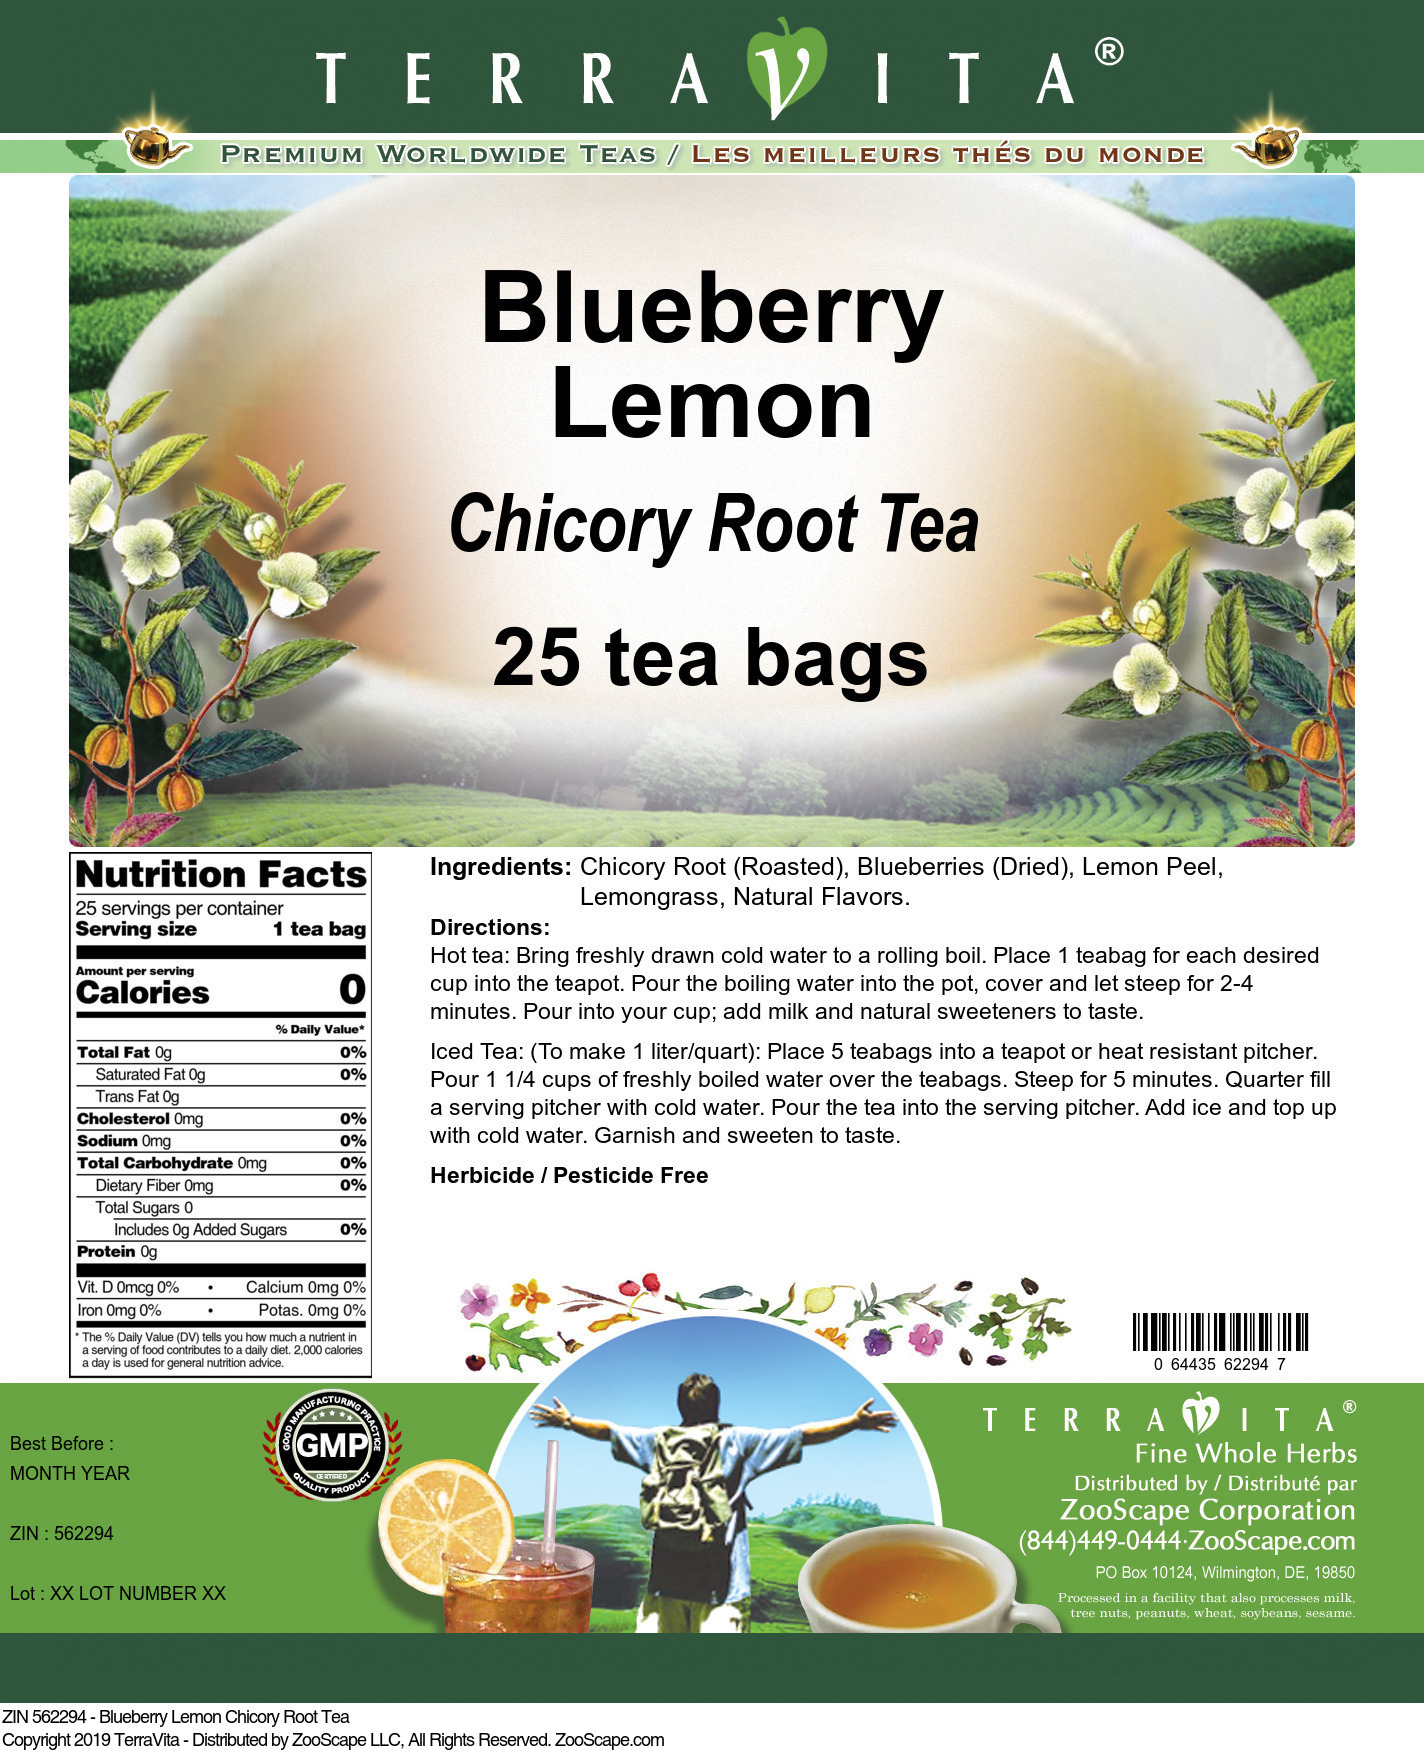 Blueberry Lemon Chicory Root